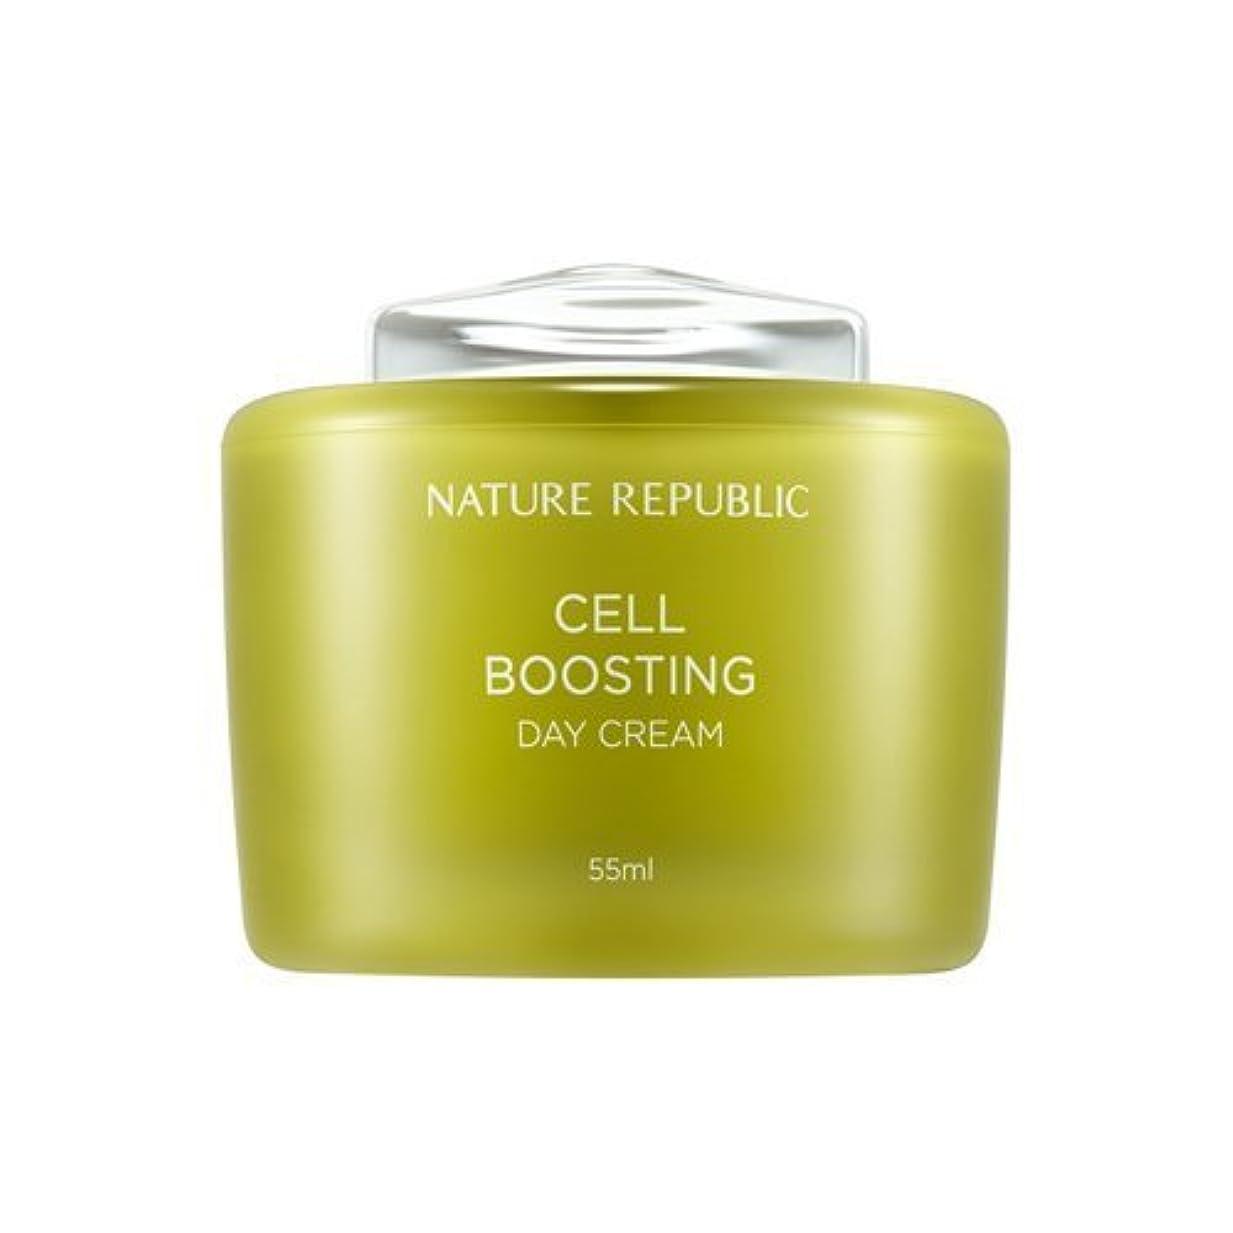 NATUREREPUBLIC Cell boosting Day Cream